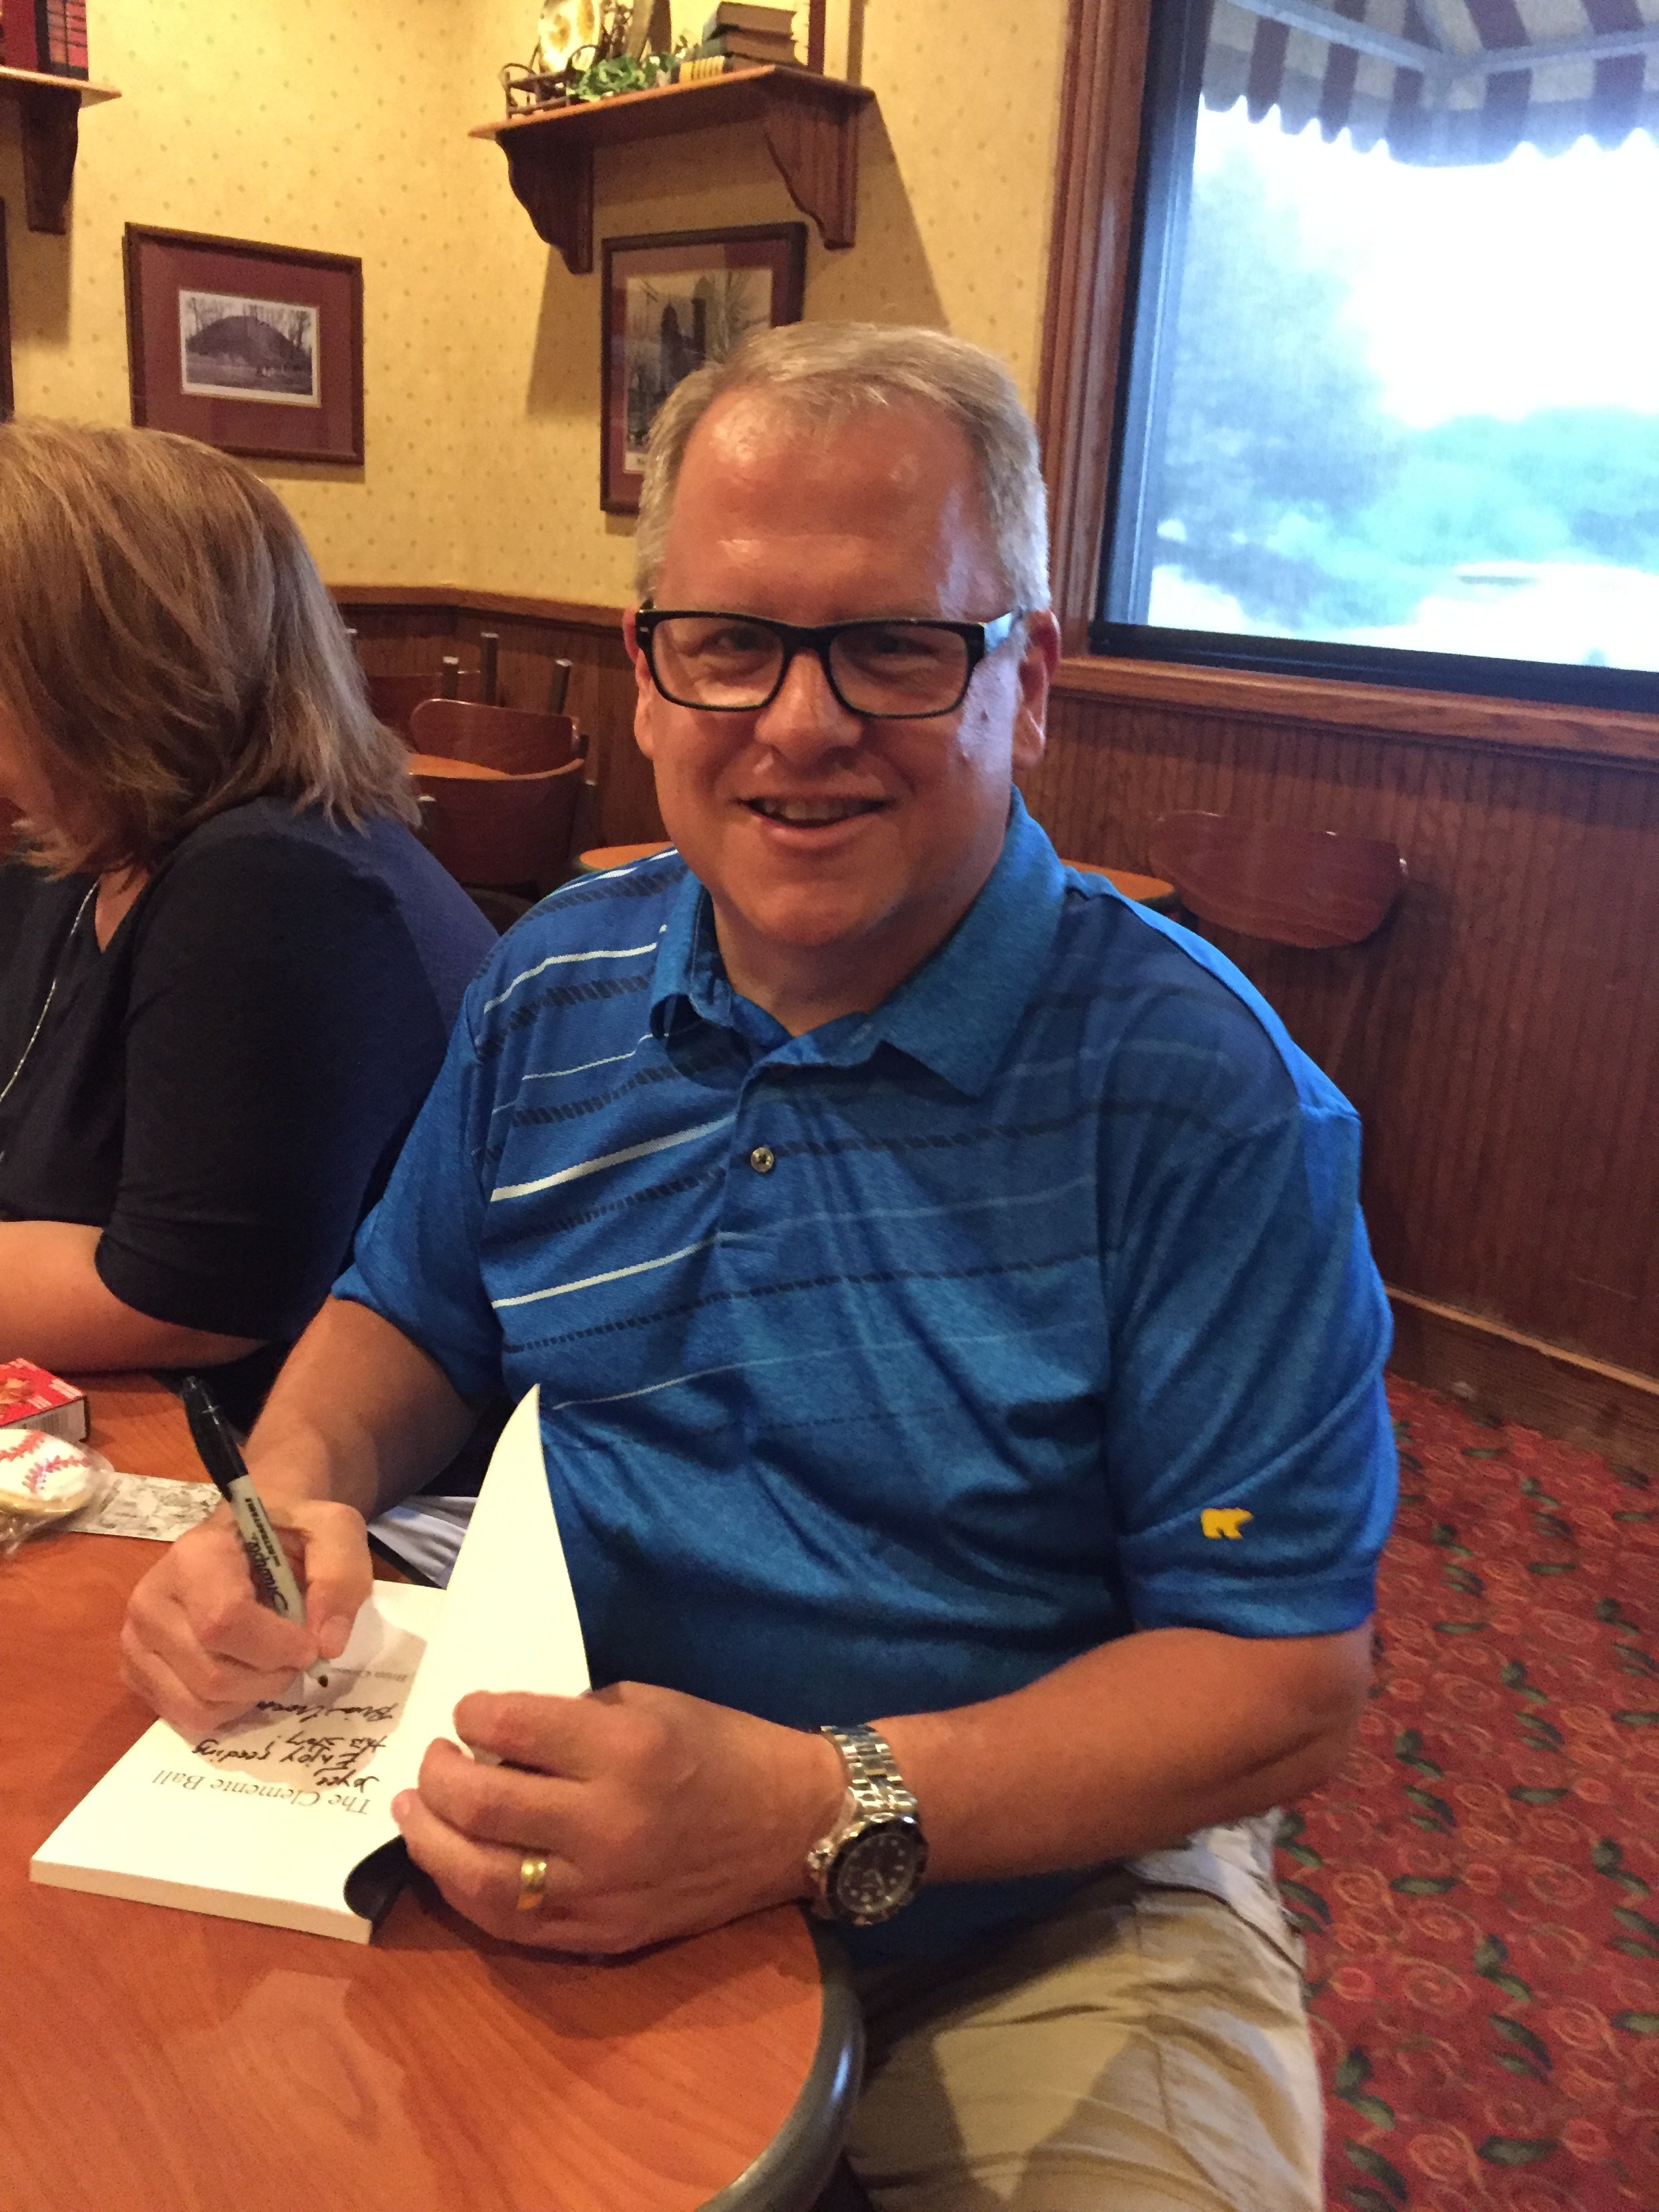 Brian Croasmun - Teacher, Broadcaster, Coach, Writer